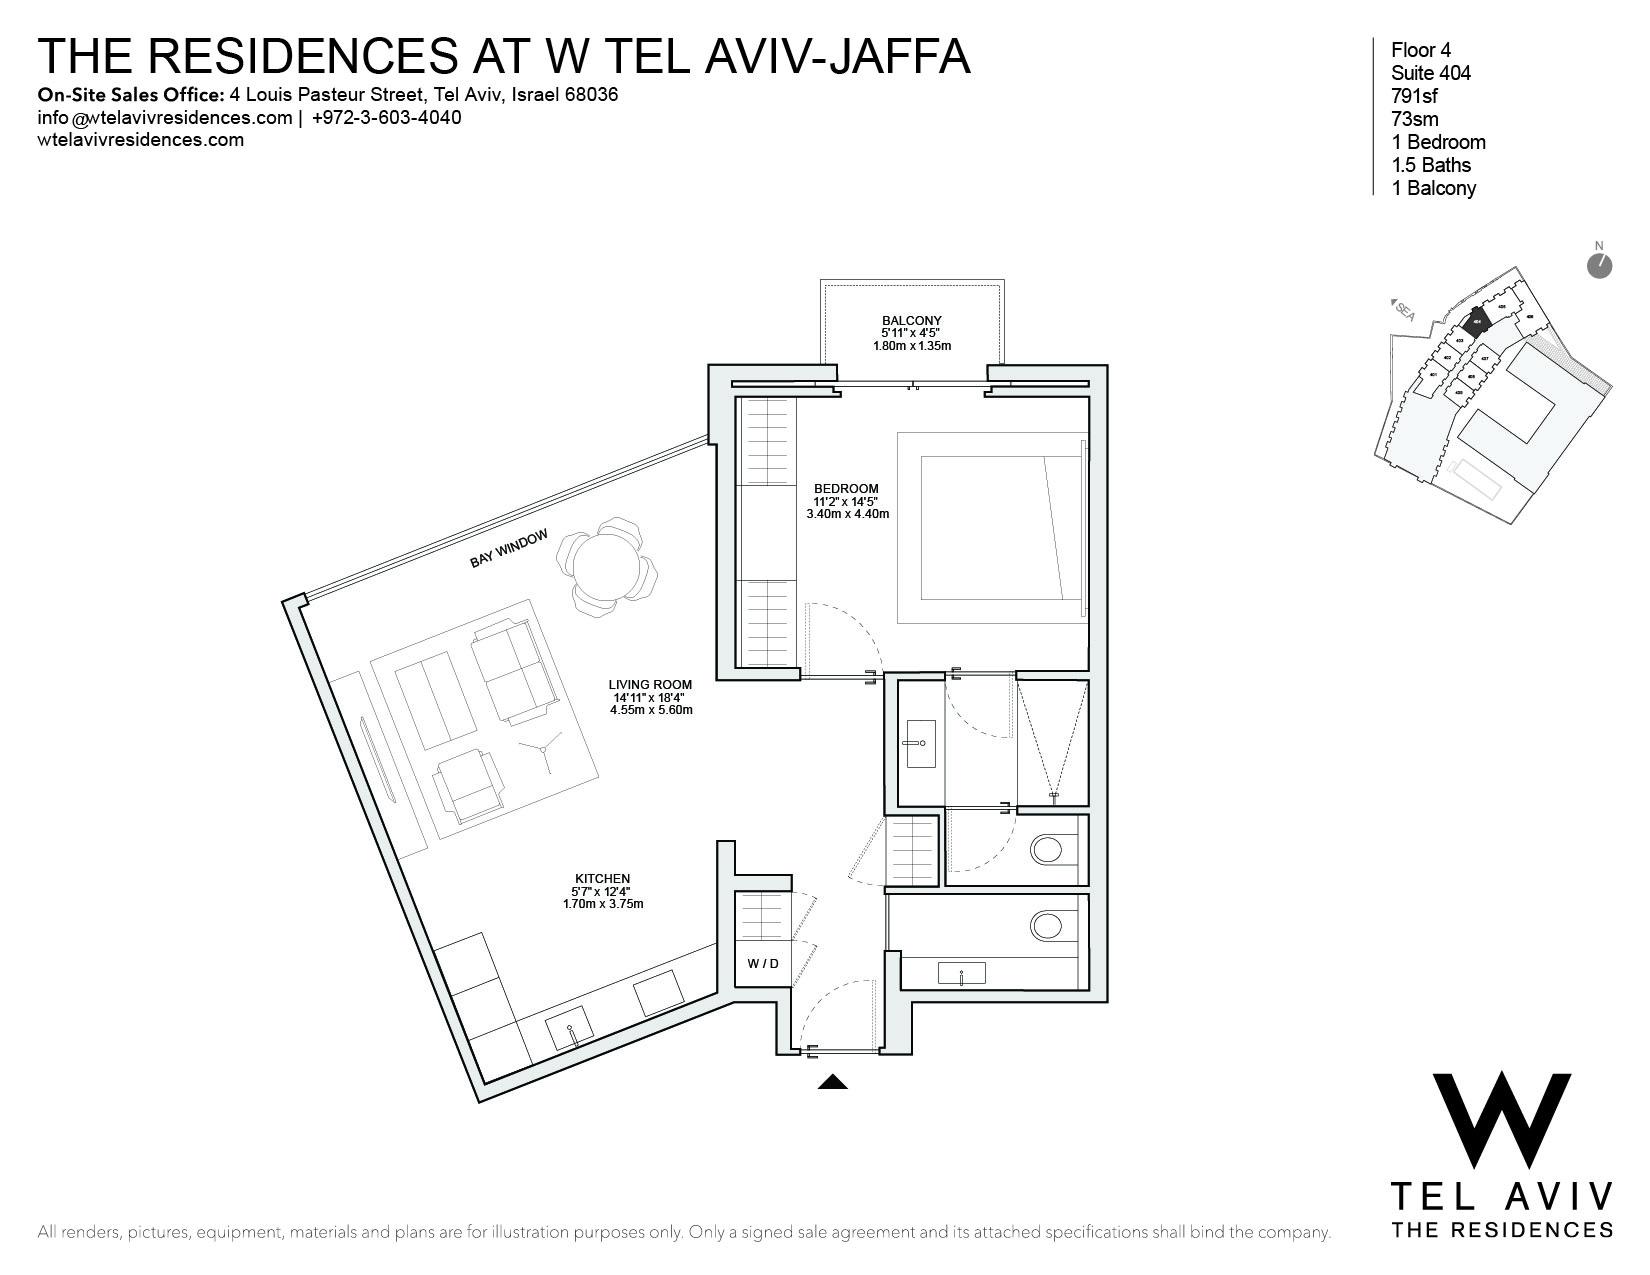 Einfamilienhaus für Verkauf beim W Tel Aviv Residences, 404 Luxury Apartment Tel Aviv, Israel 68036 Israel